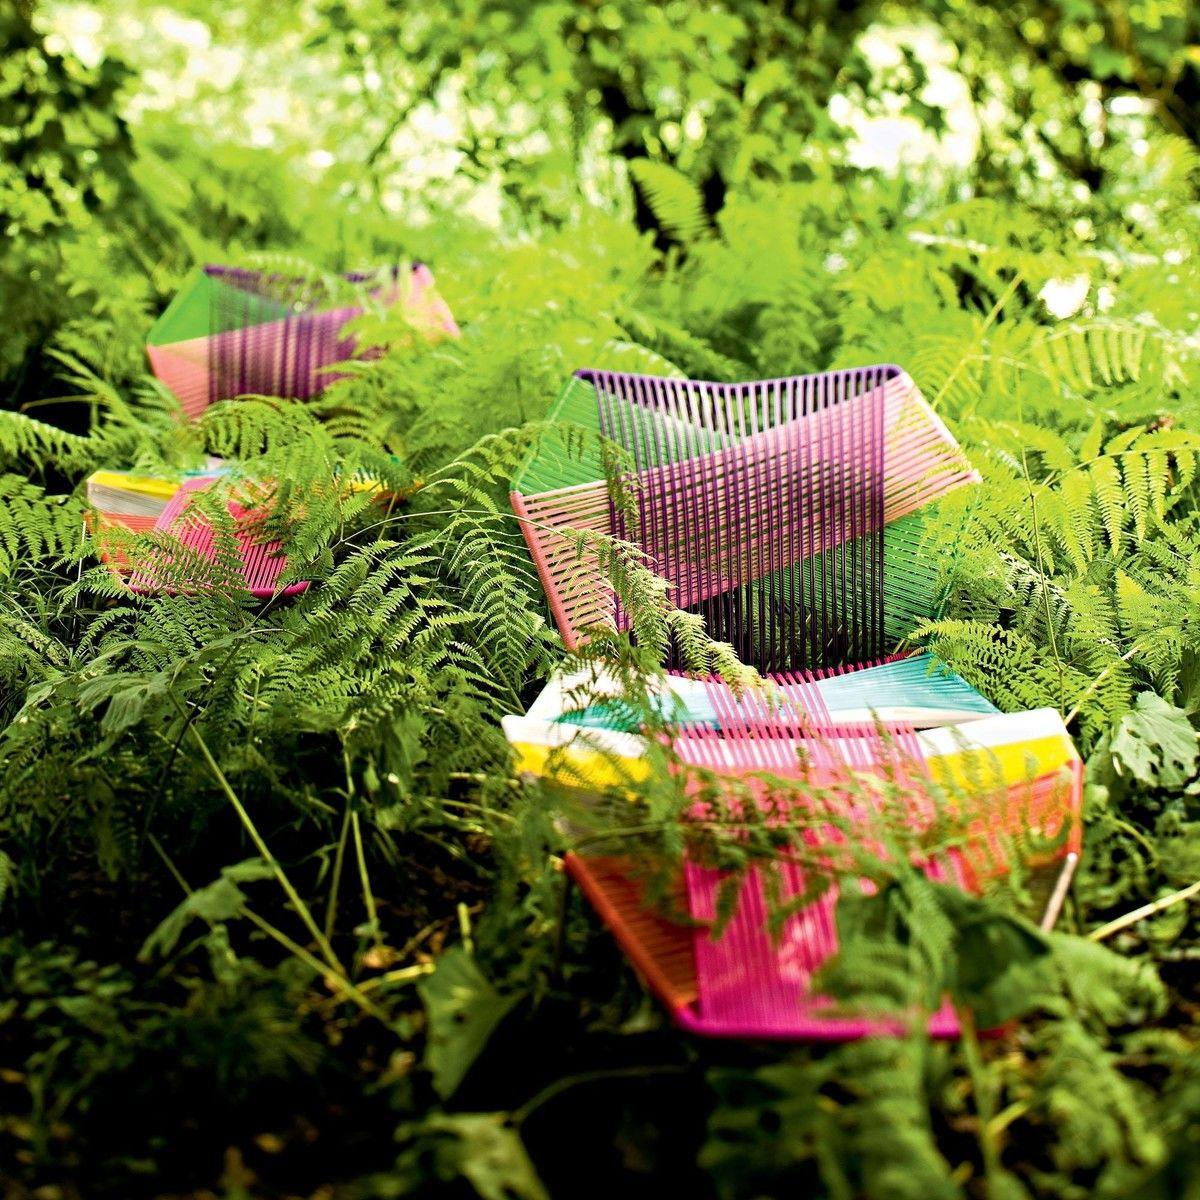 Tropicalia chaise longue moroso for Antibodi chaise longue by patricia urquiola